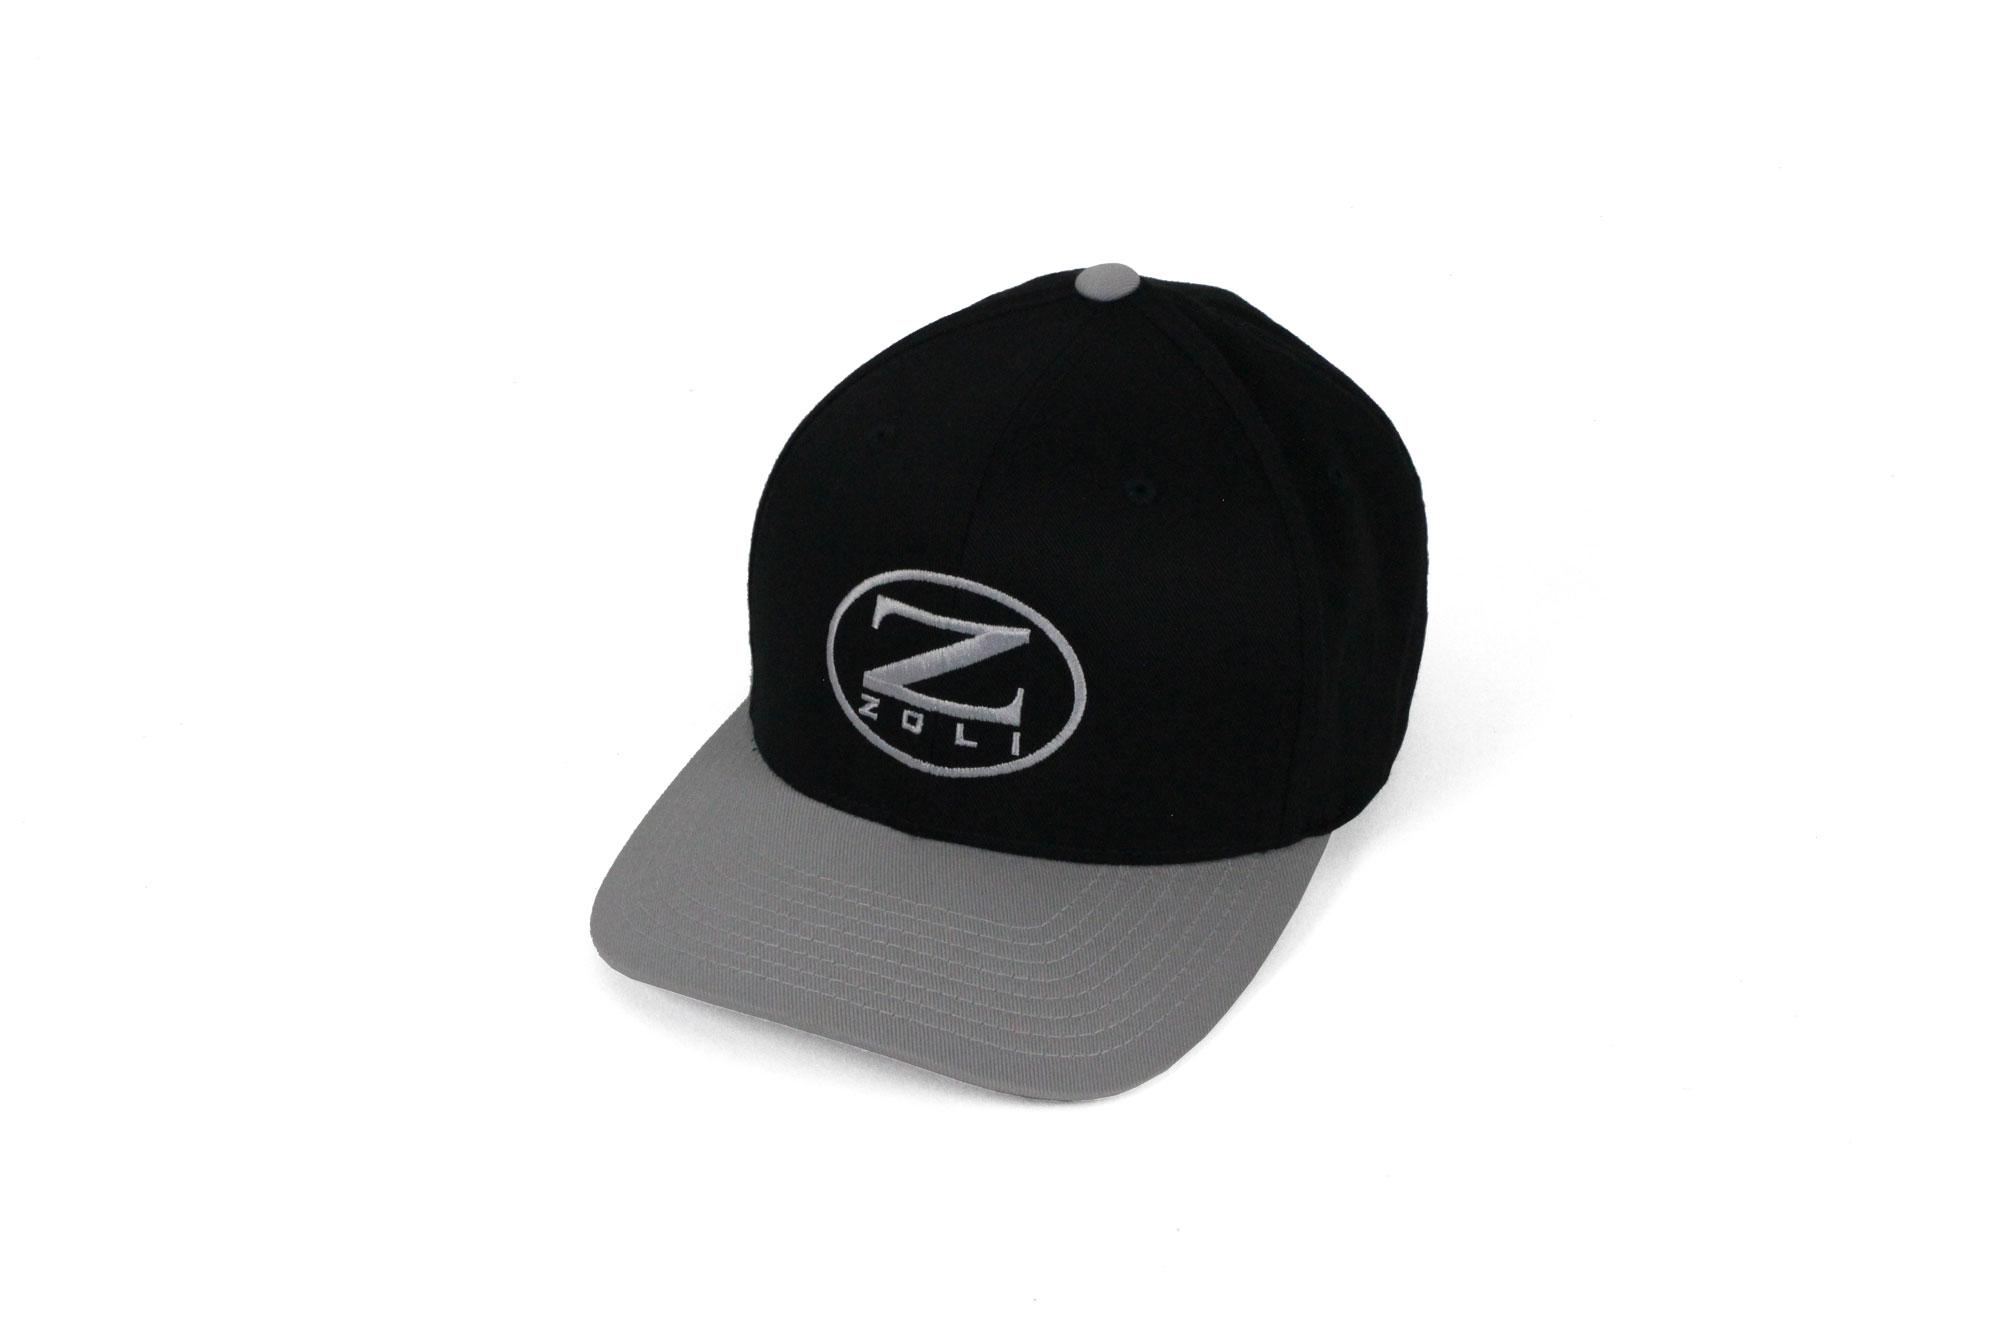 Zoli Embroidered Flexfit® Hat (Black)